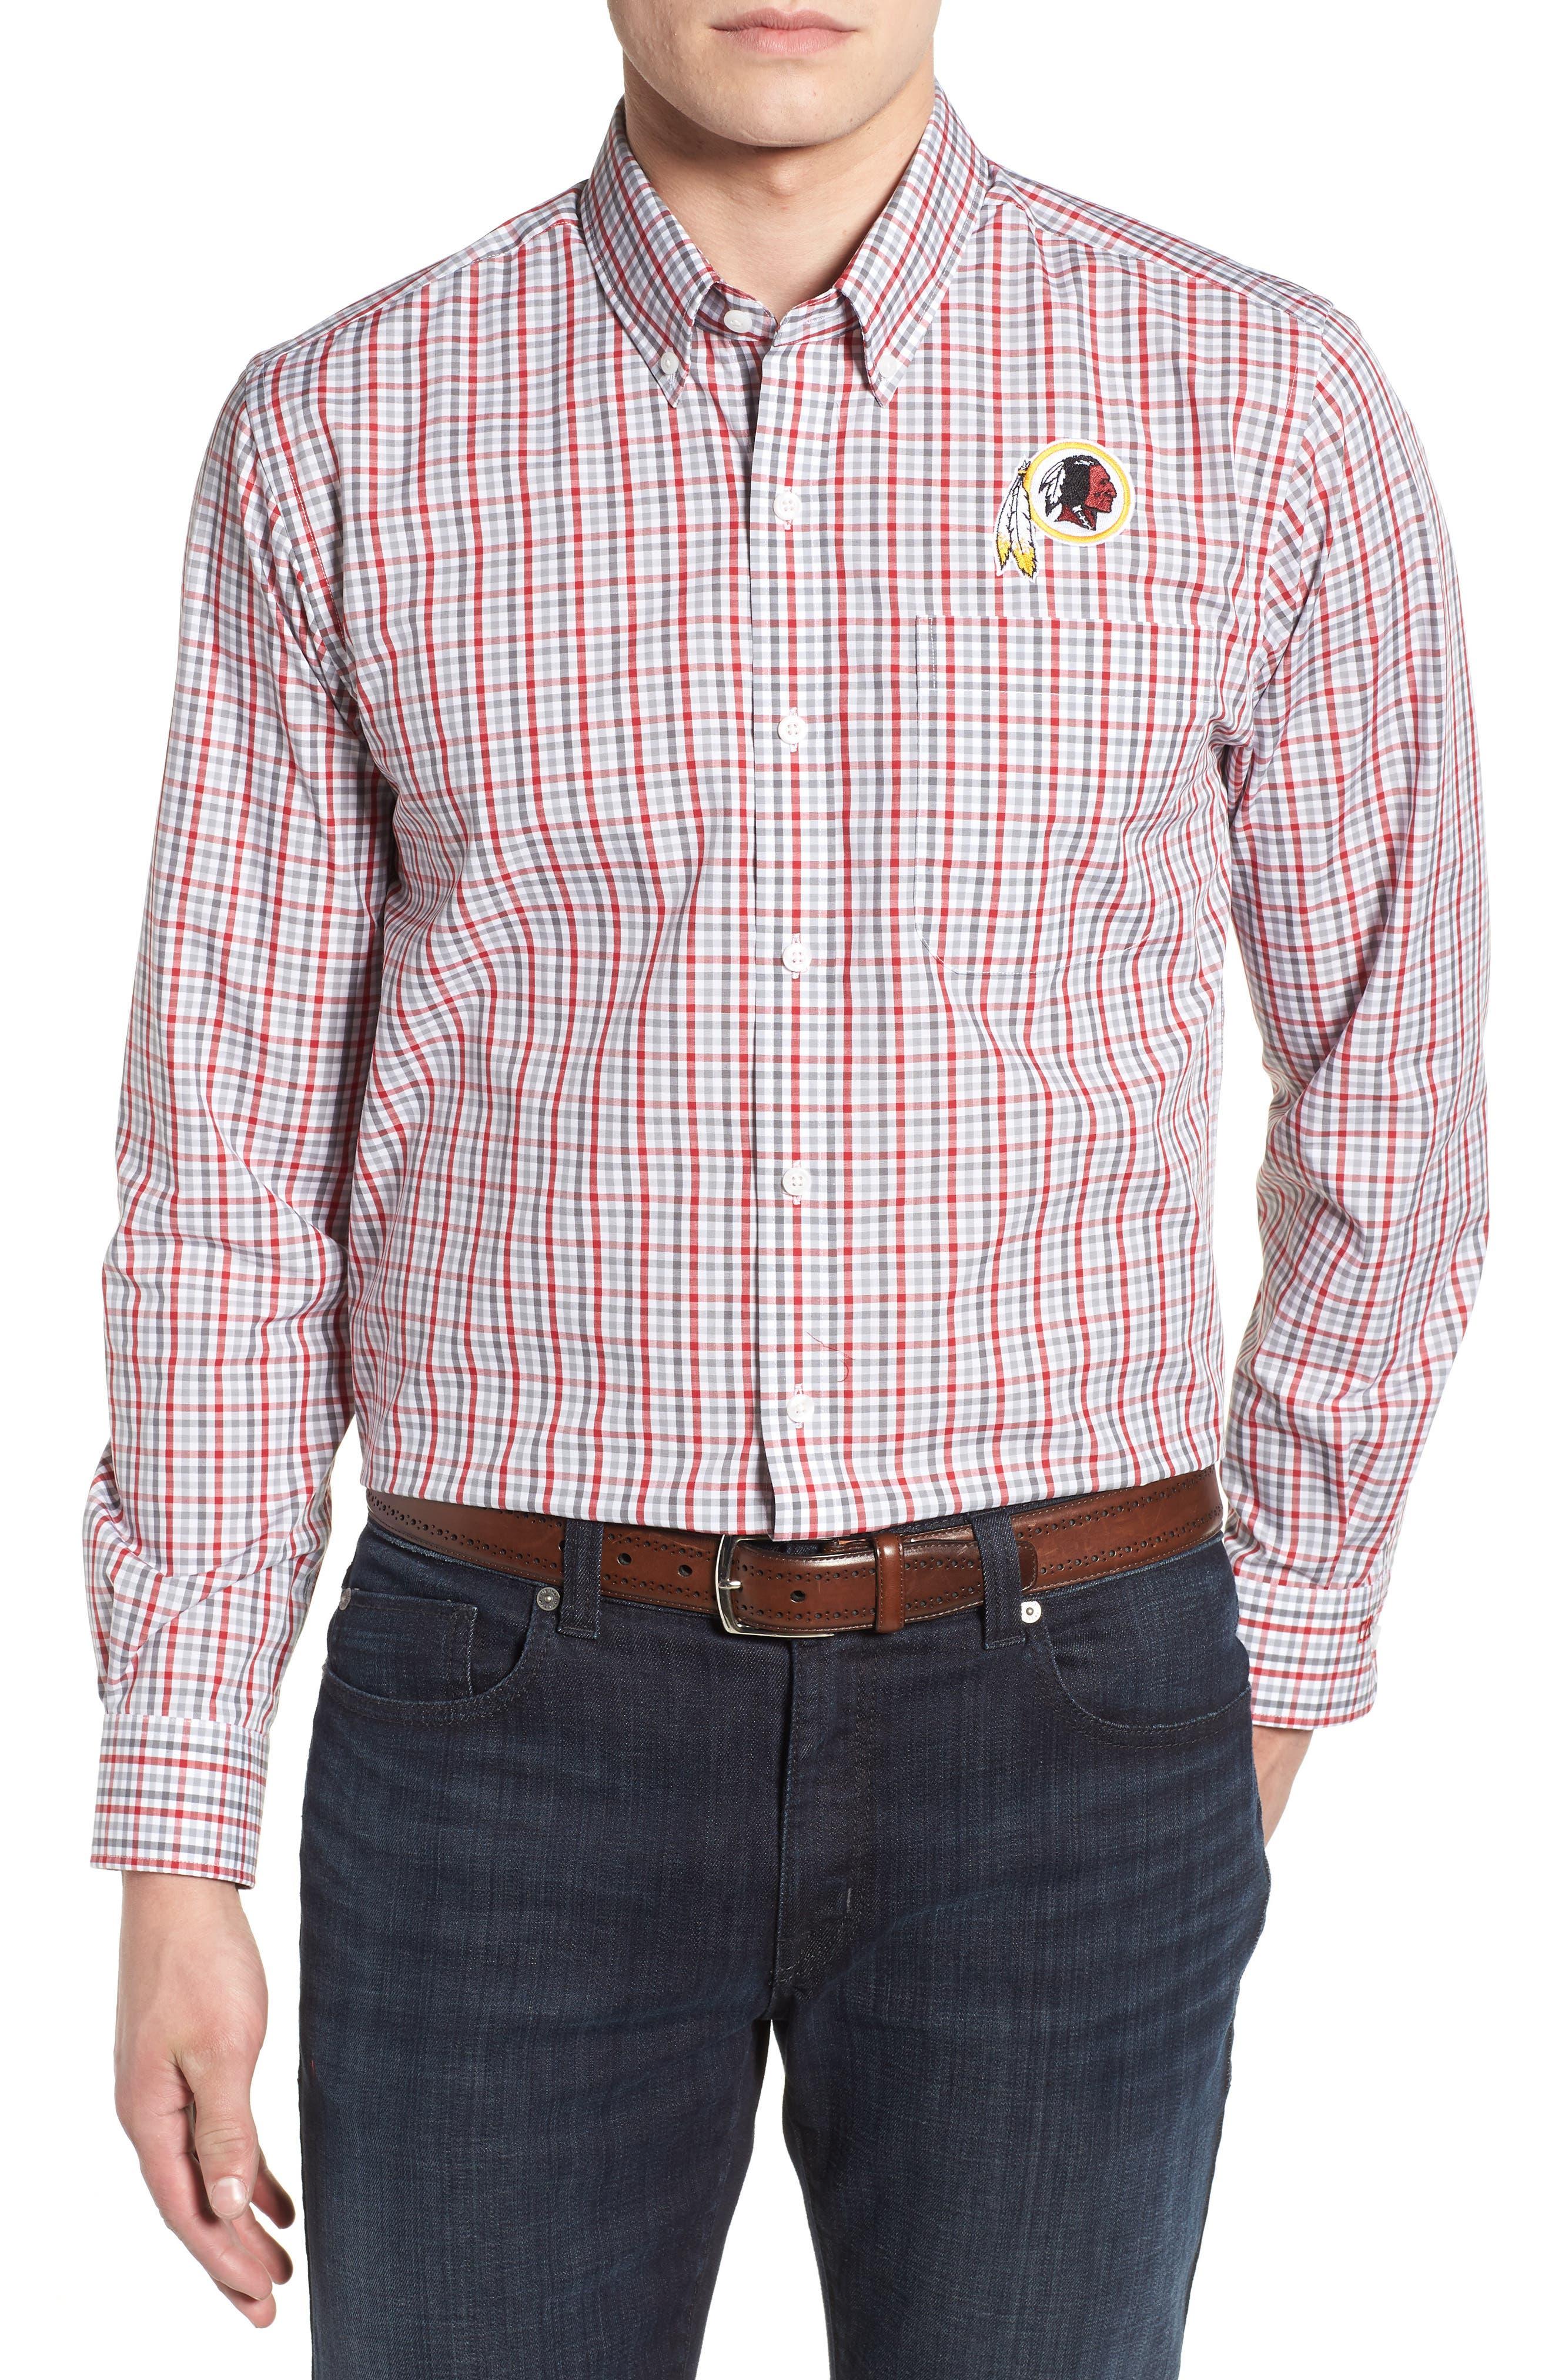 Washington - Gilman Regular Fit Plaid Sport Shirt,                         Main,                         color, CARDINAL RED